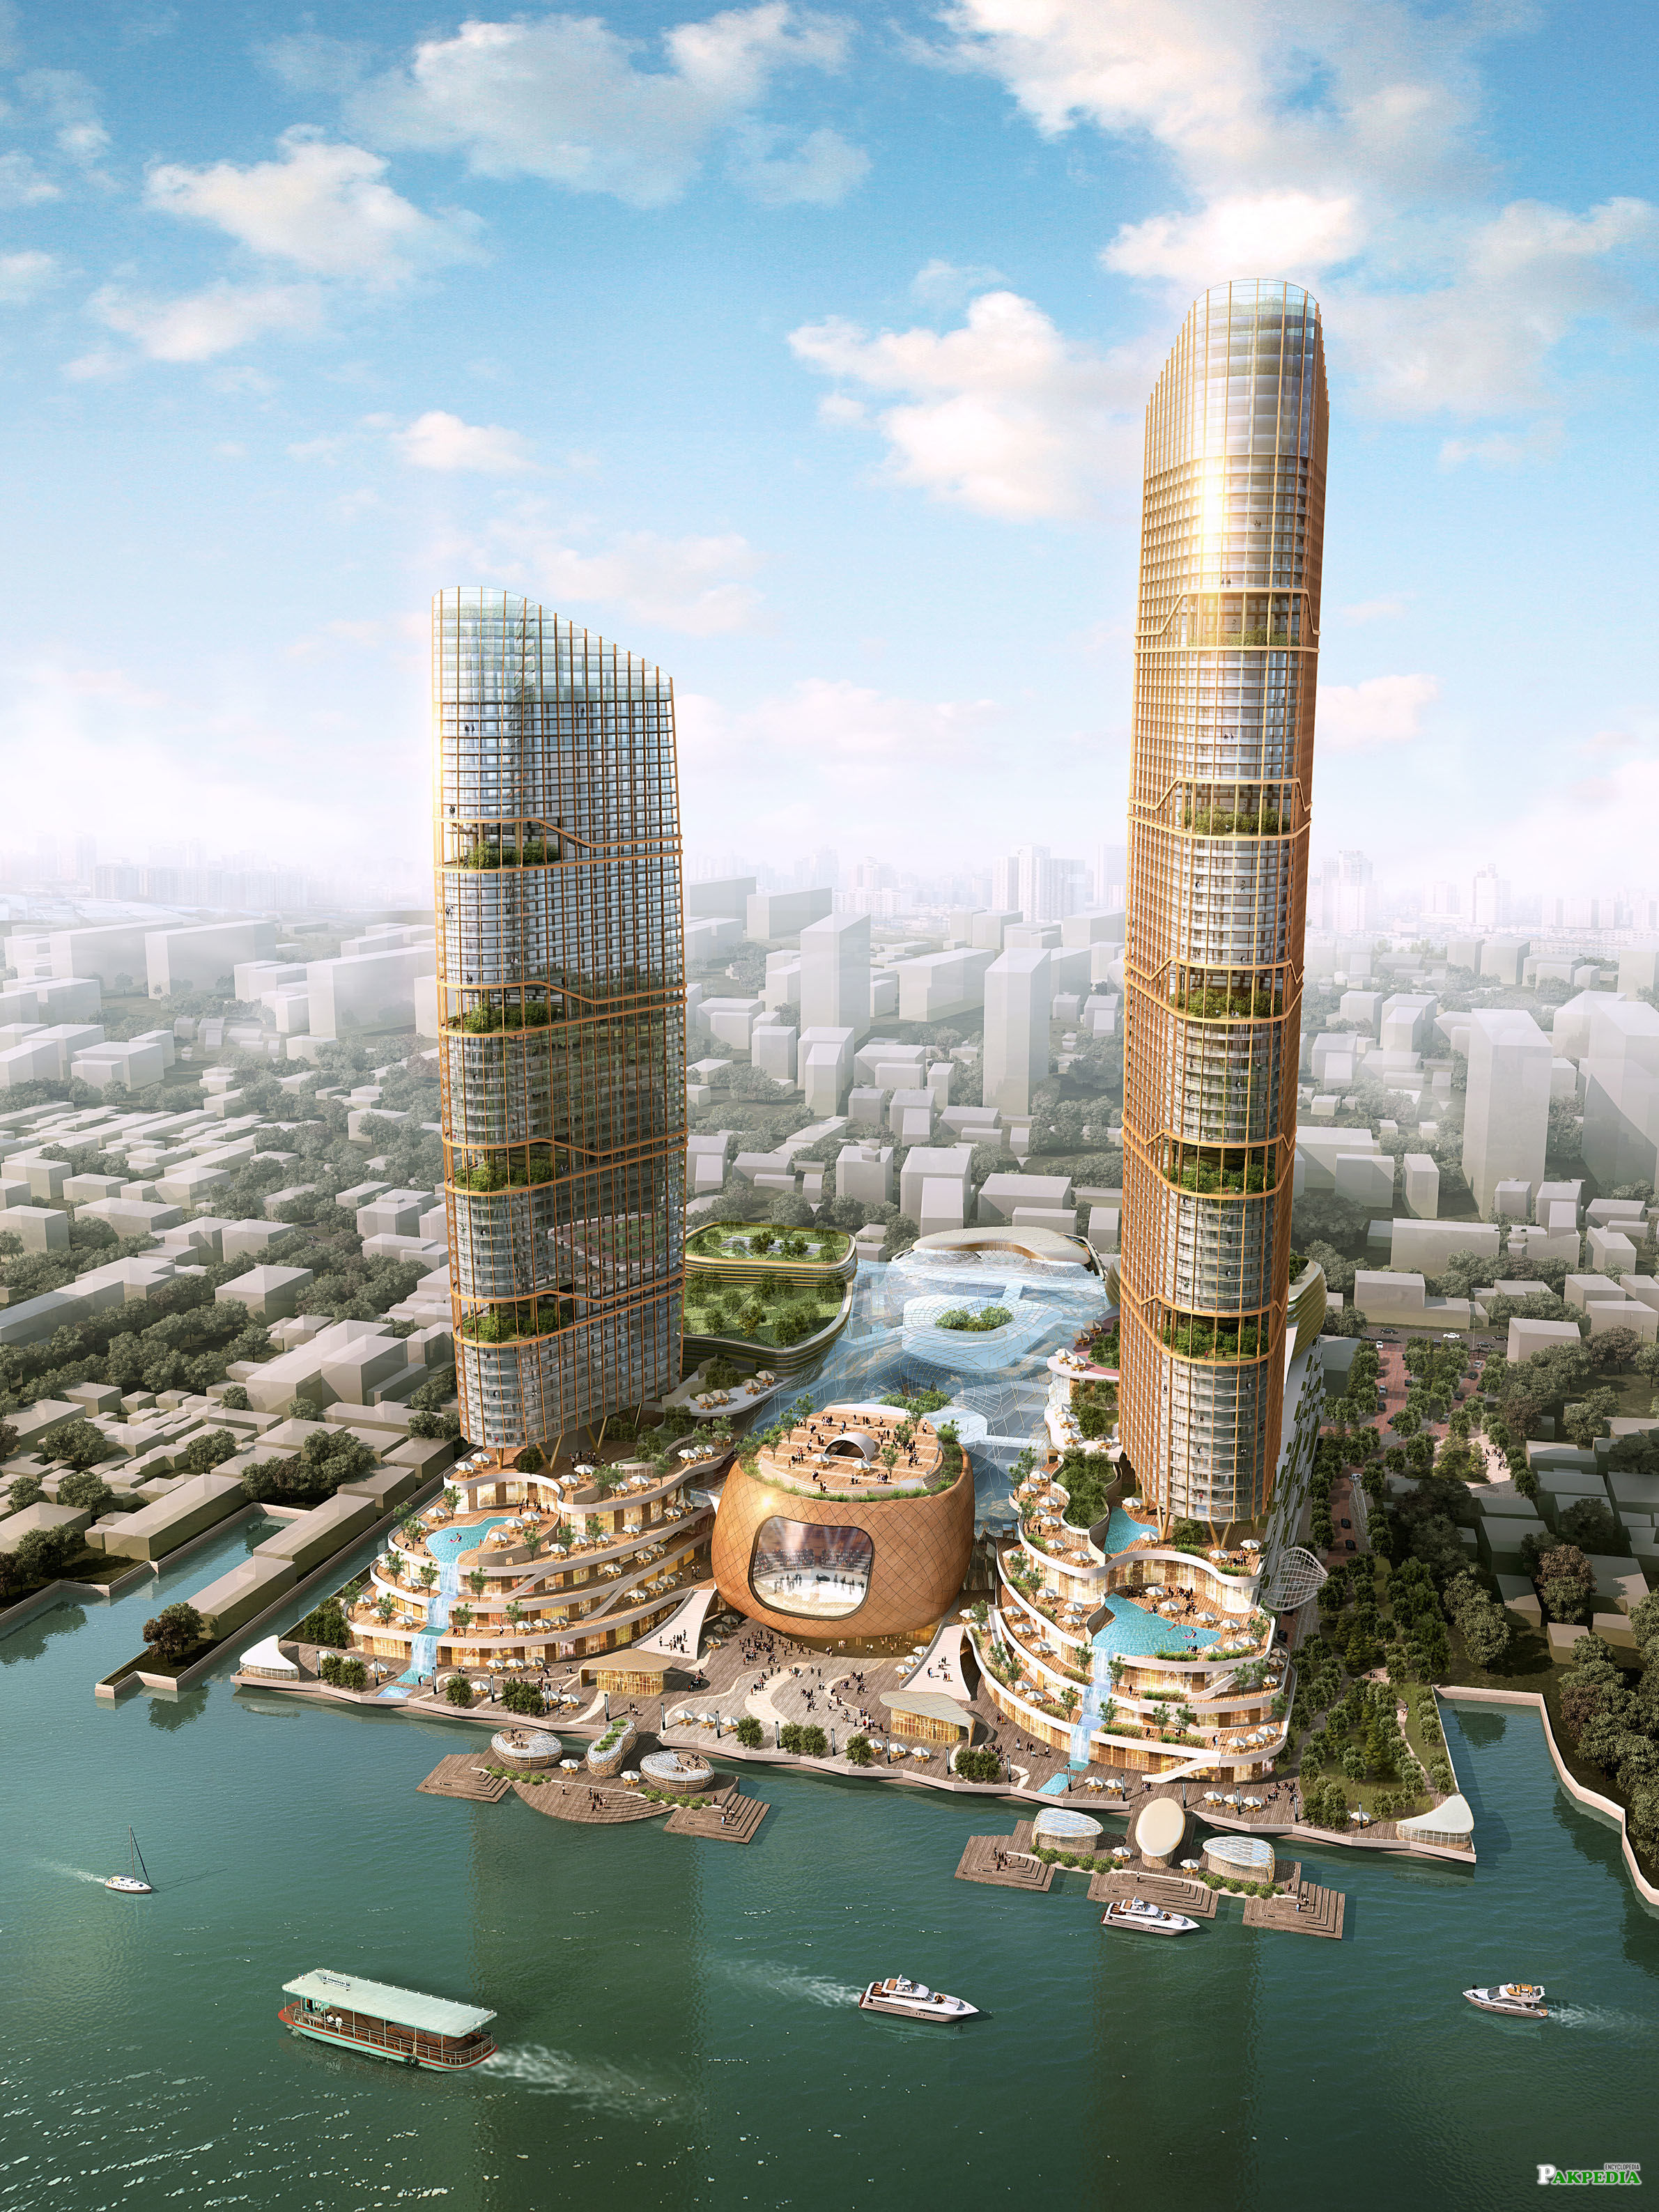 CGI tower in Dubai